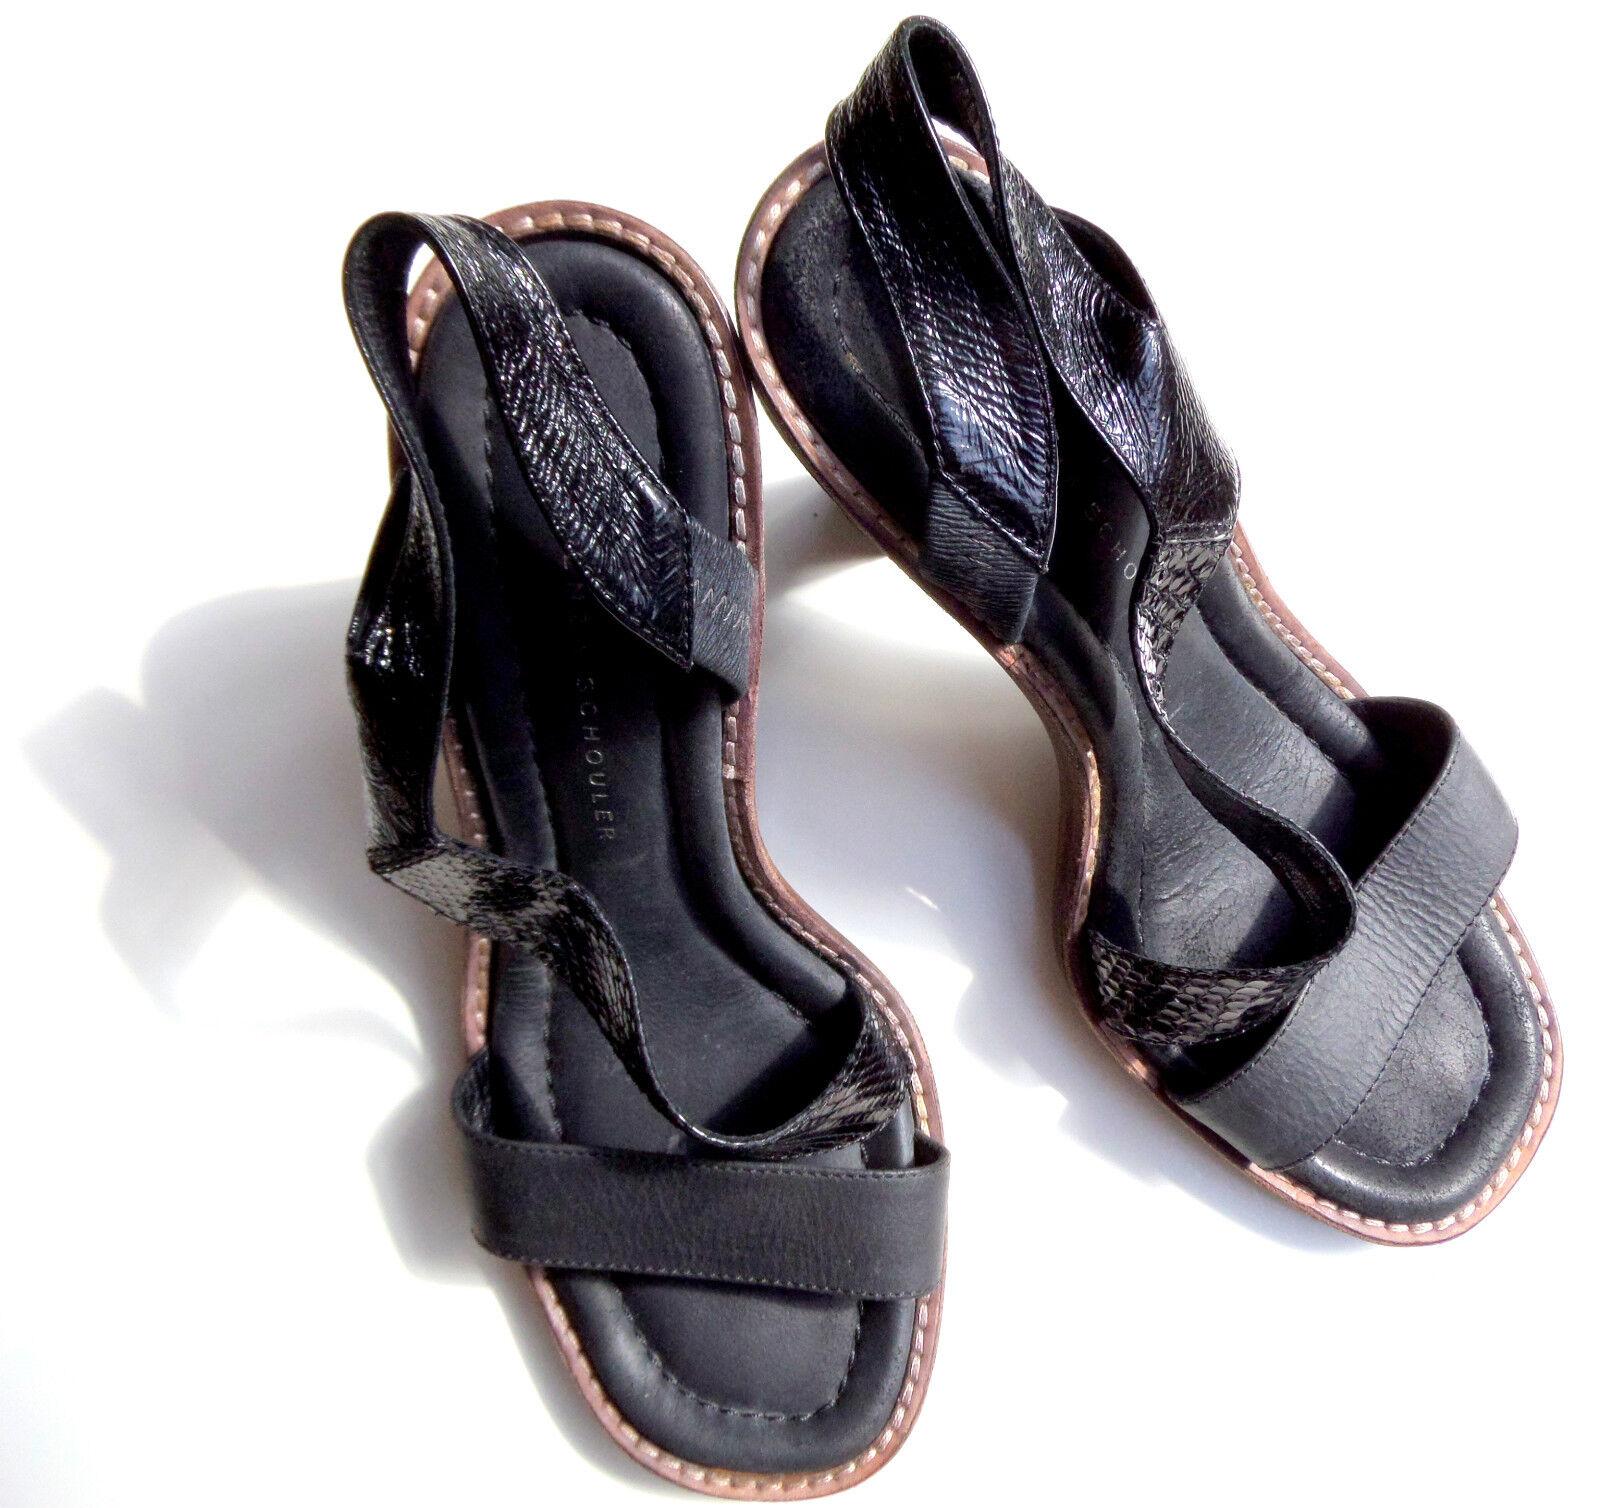 T O P PROENZA SCHOULER Damen Leder Sandaleette Art in Gr. 38.5 e v t l. 39